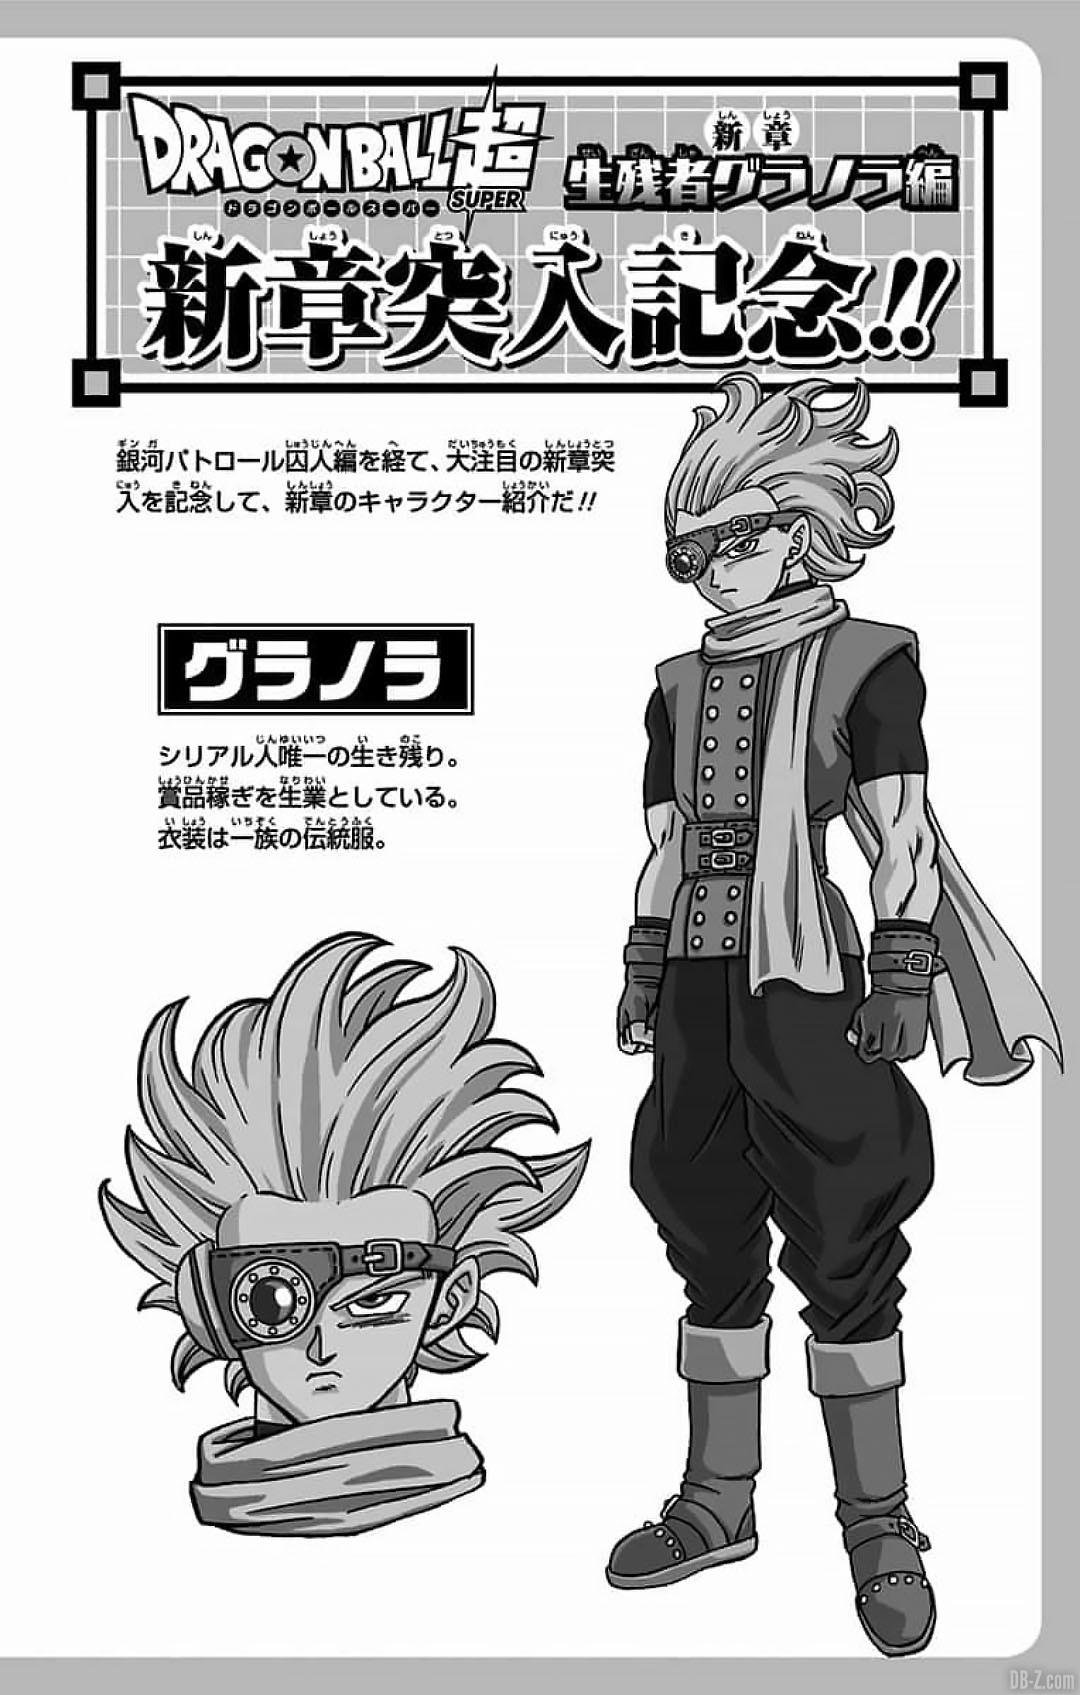 Tome-15-Dragon-Ball-Super-Image-Bonus-23